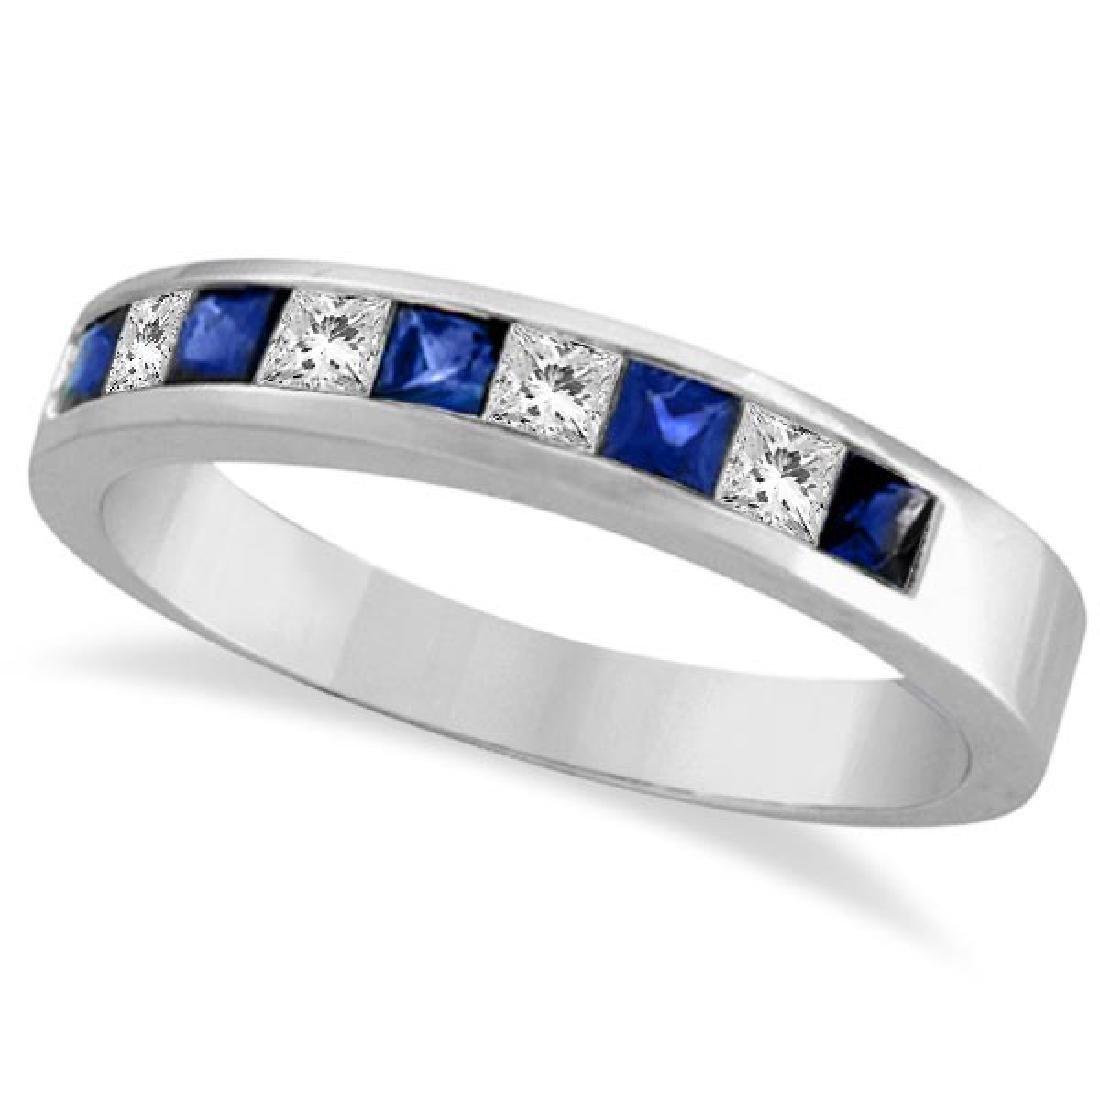 Princess-Cut Channel-Set Diamond and Sapphire Ring Band